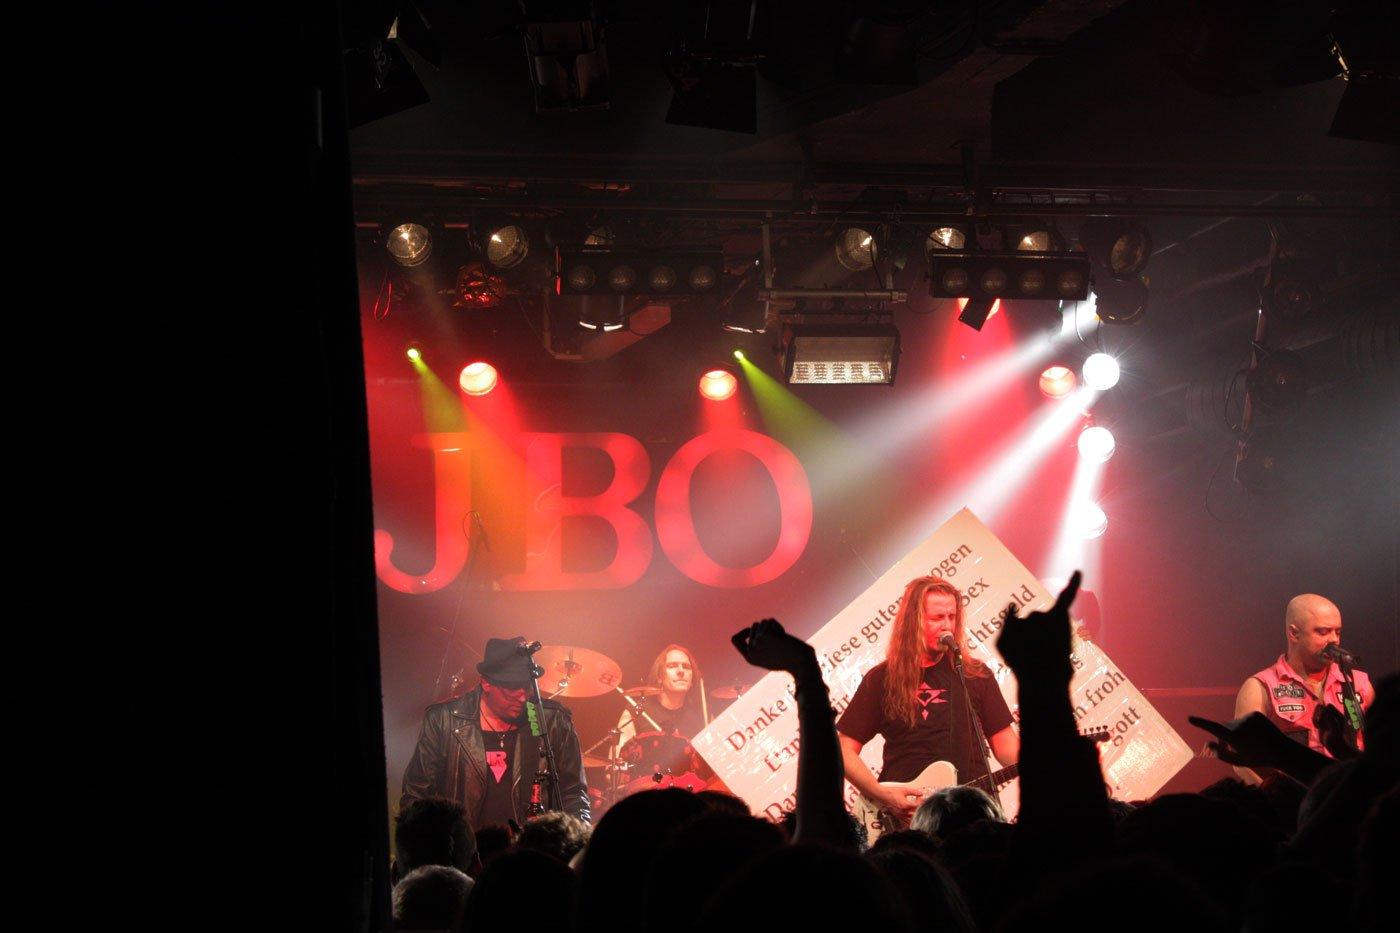 J.B.O. - Börse Wuppertal, 26.11.2010 - Foto von Florian Brinkmann - 002